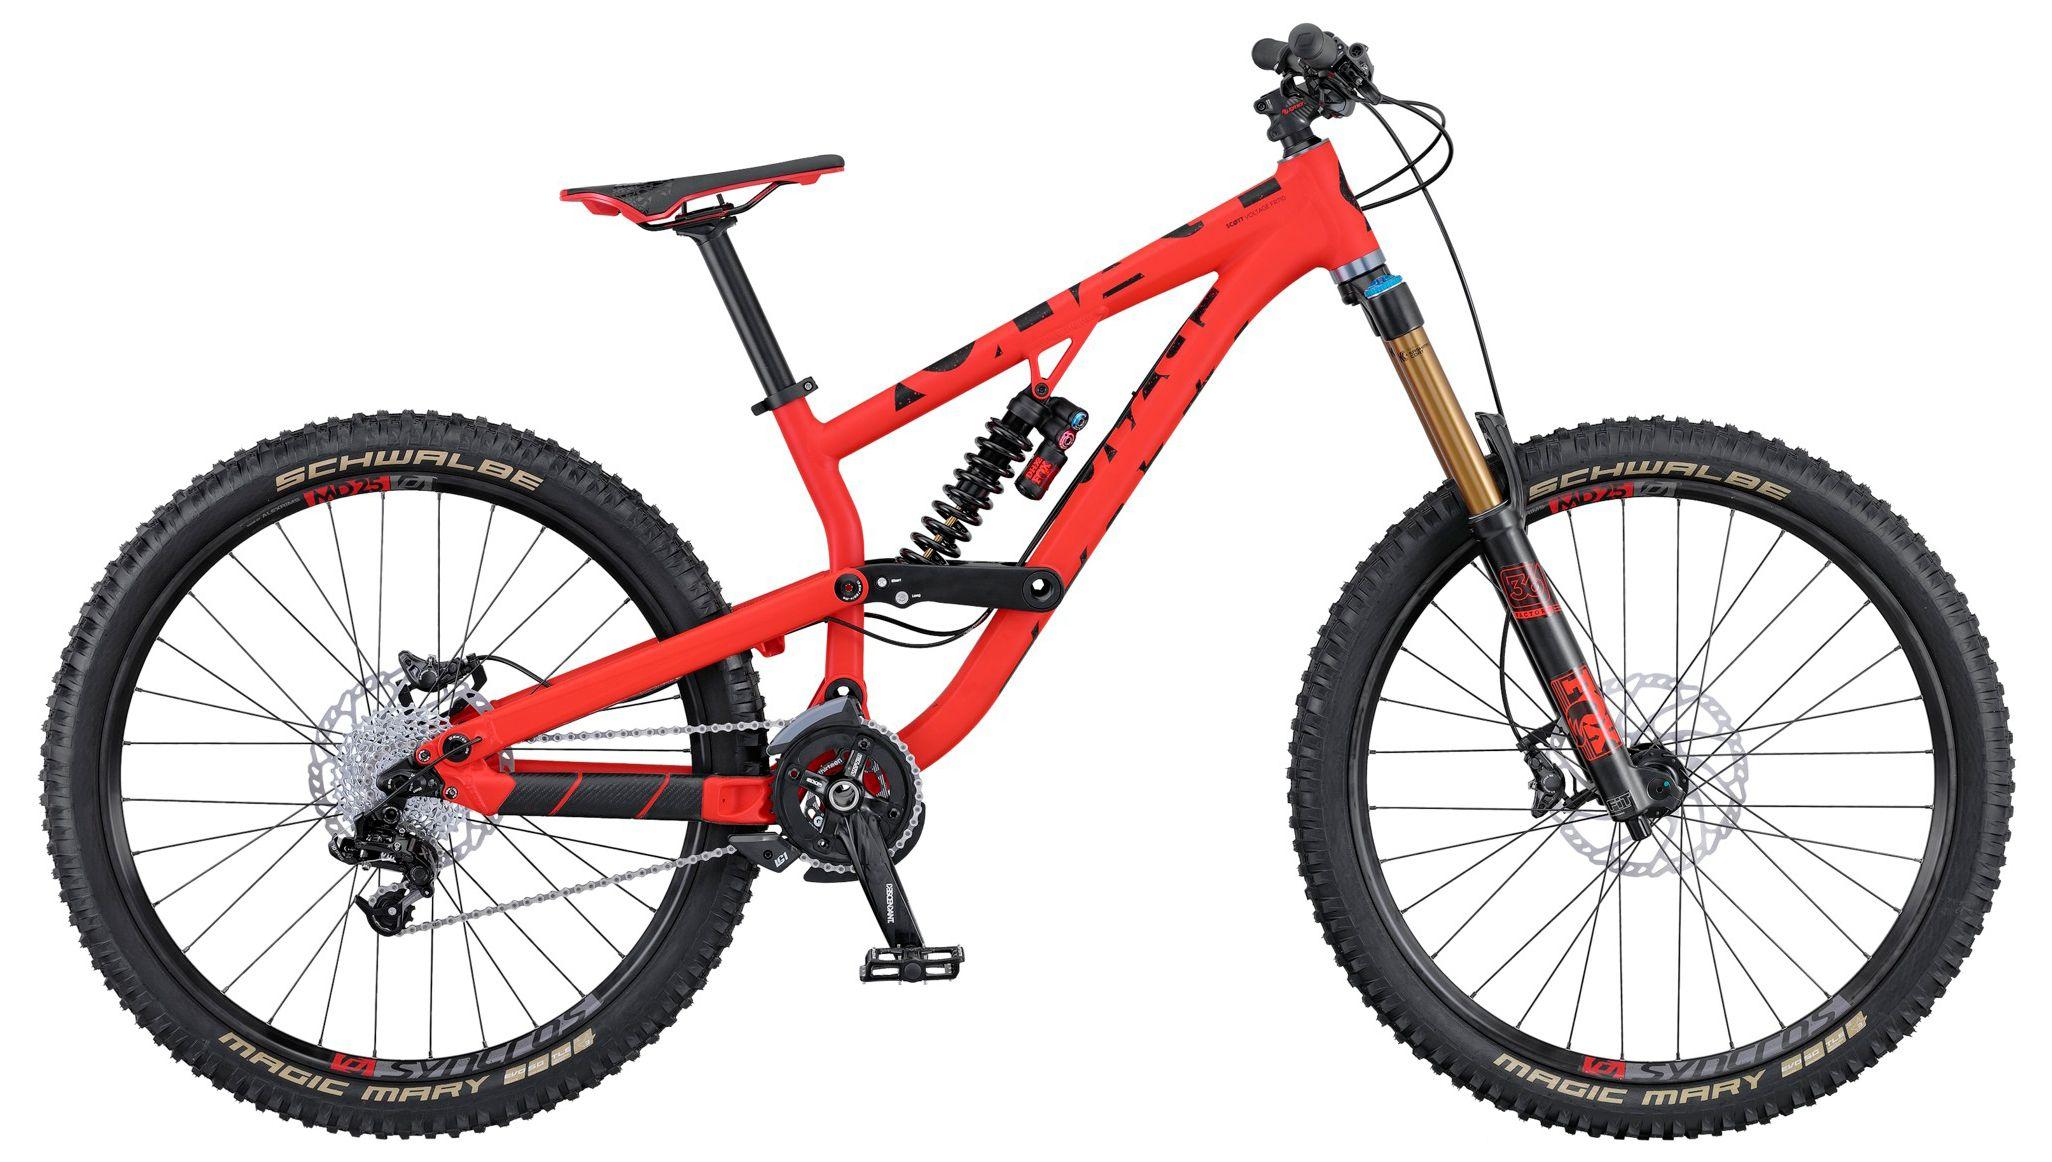 Велосипед Scott Voltage FR 710 2016 велосипед scott aspect 700 27 5 2016